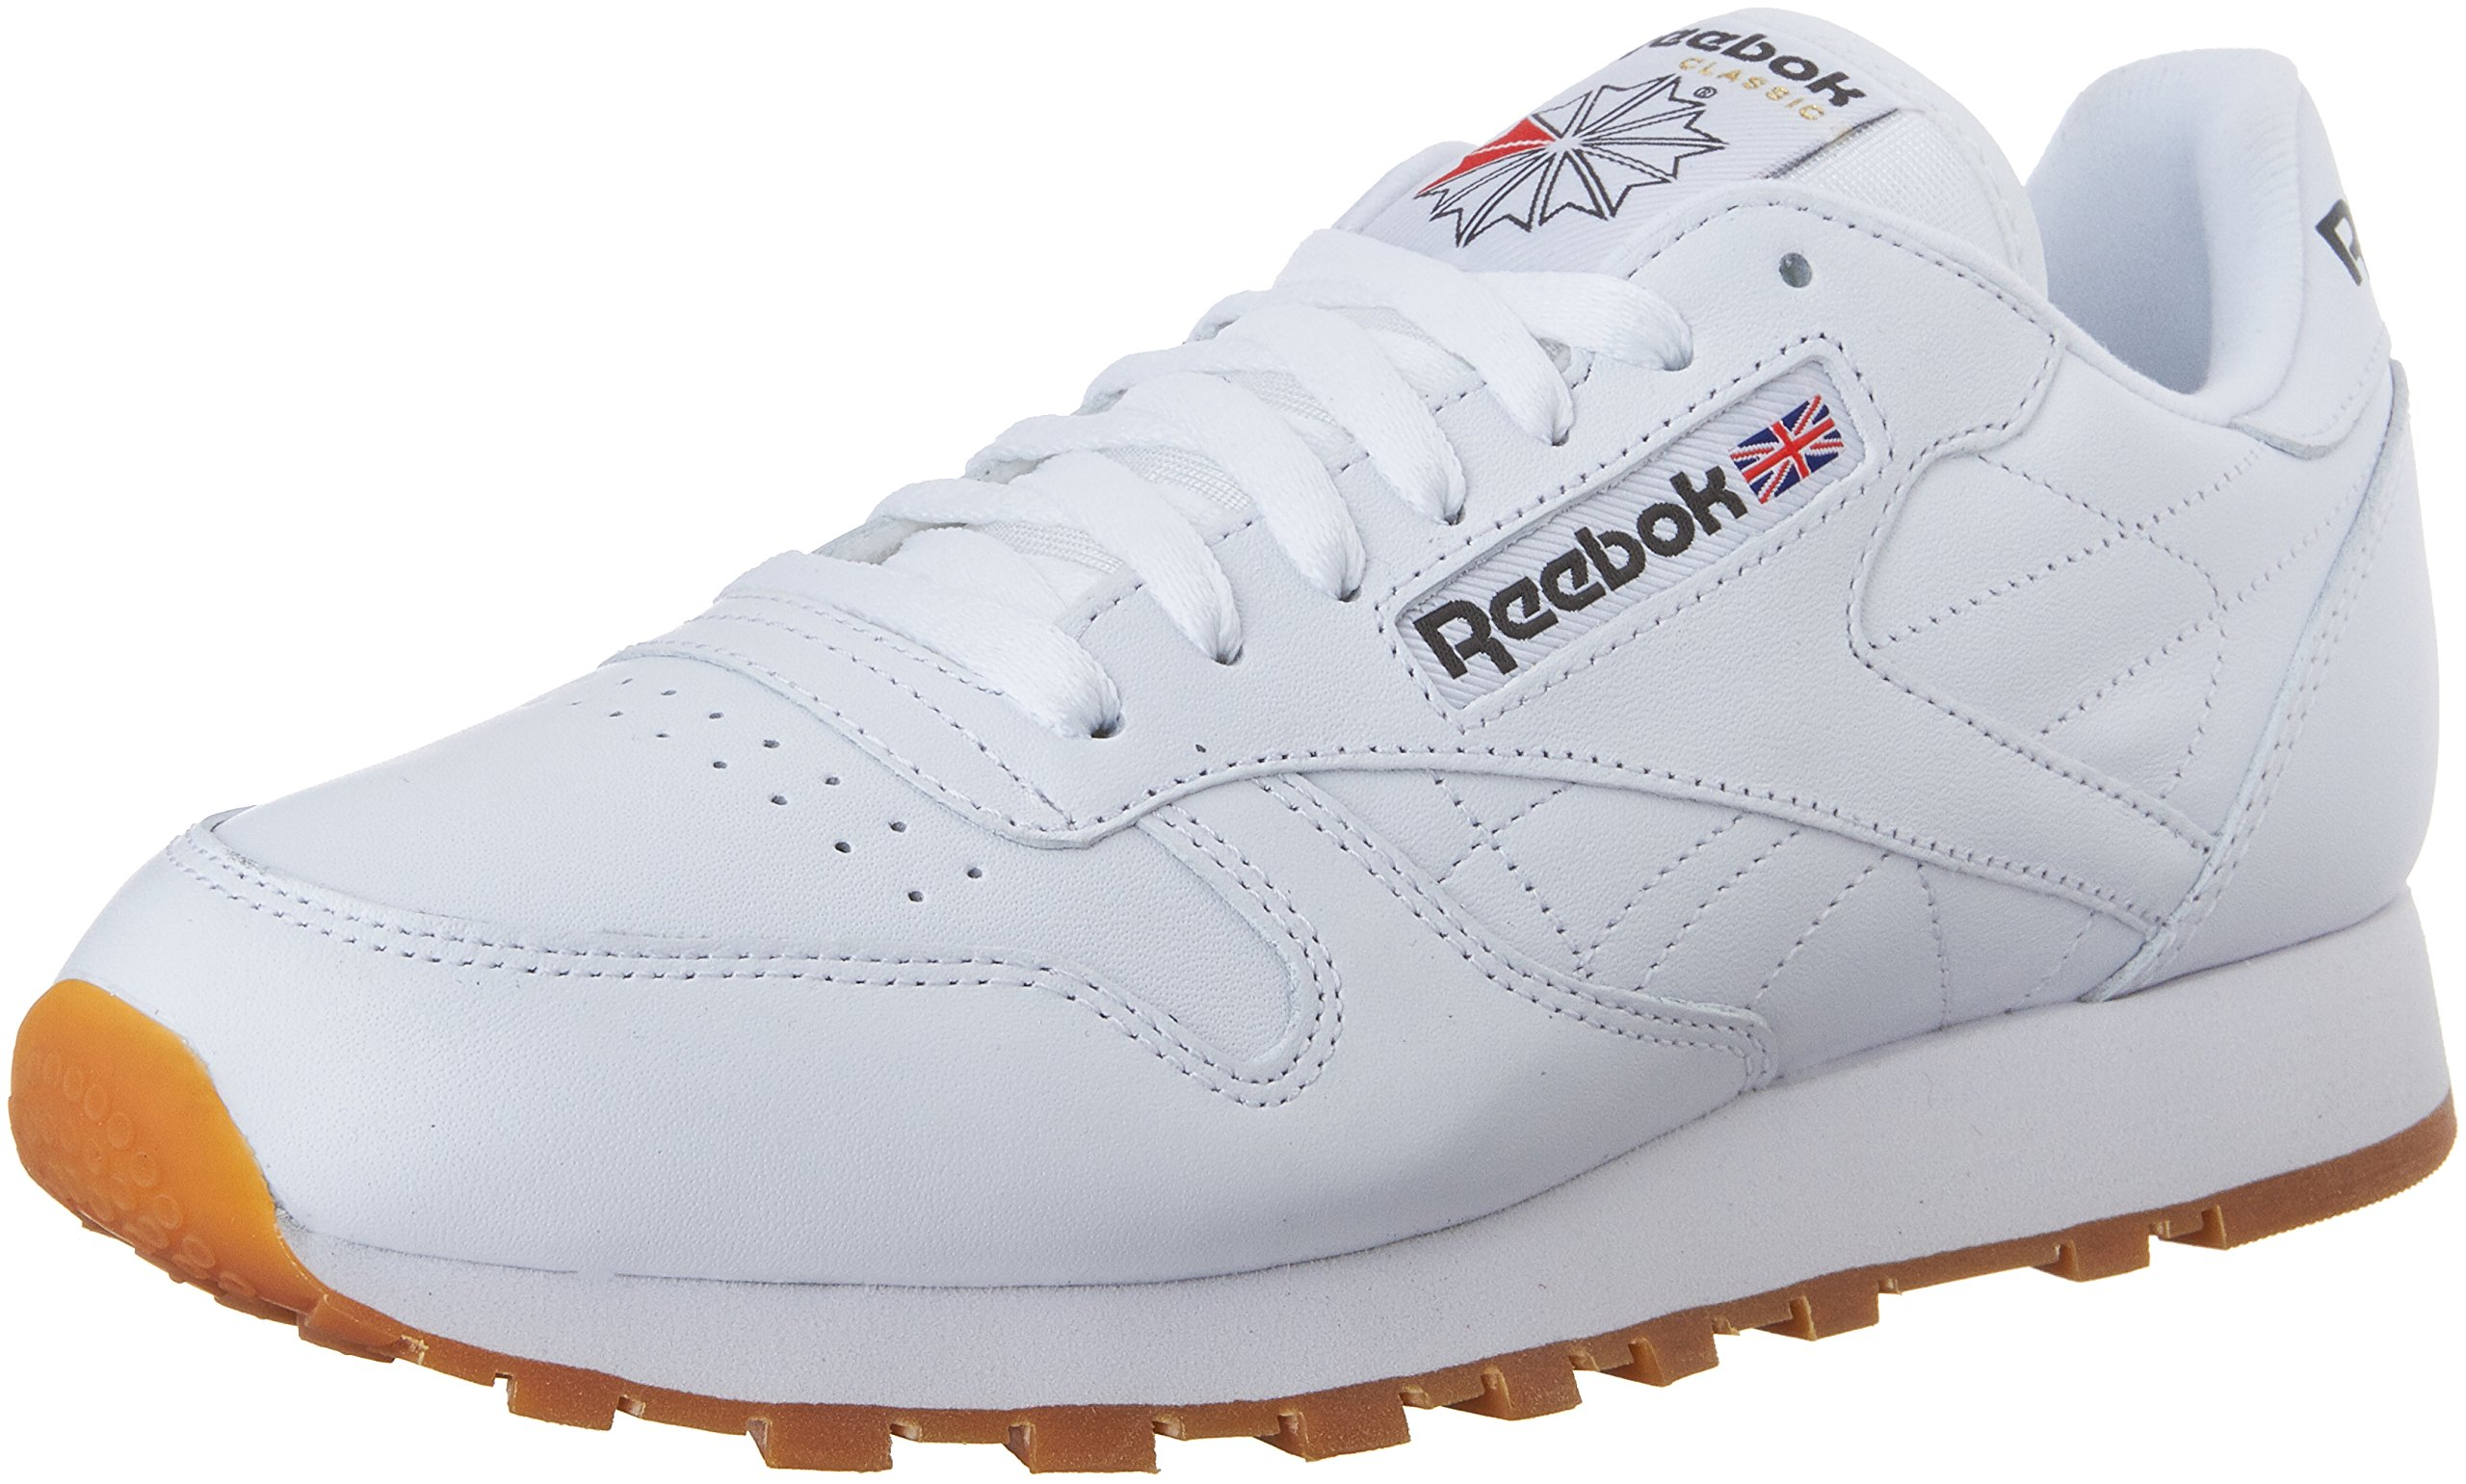 Reebok Men's Classic Leather Sneaker, White/Gum, 10 M US by Reebok